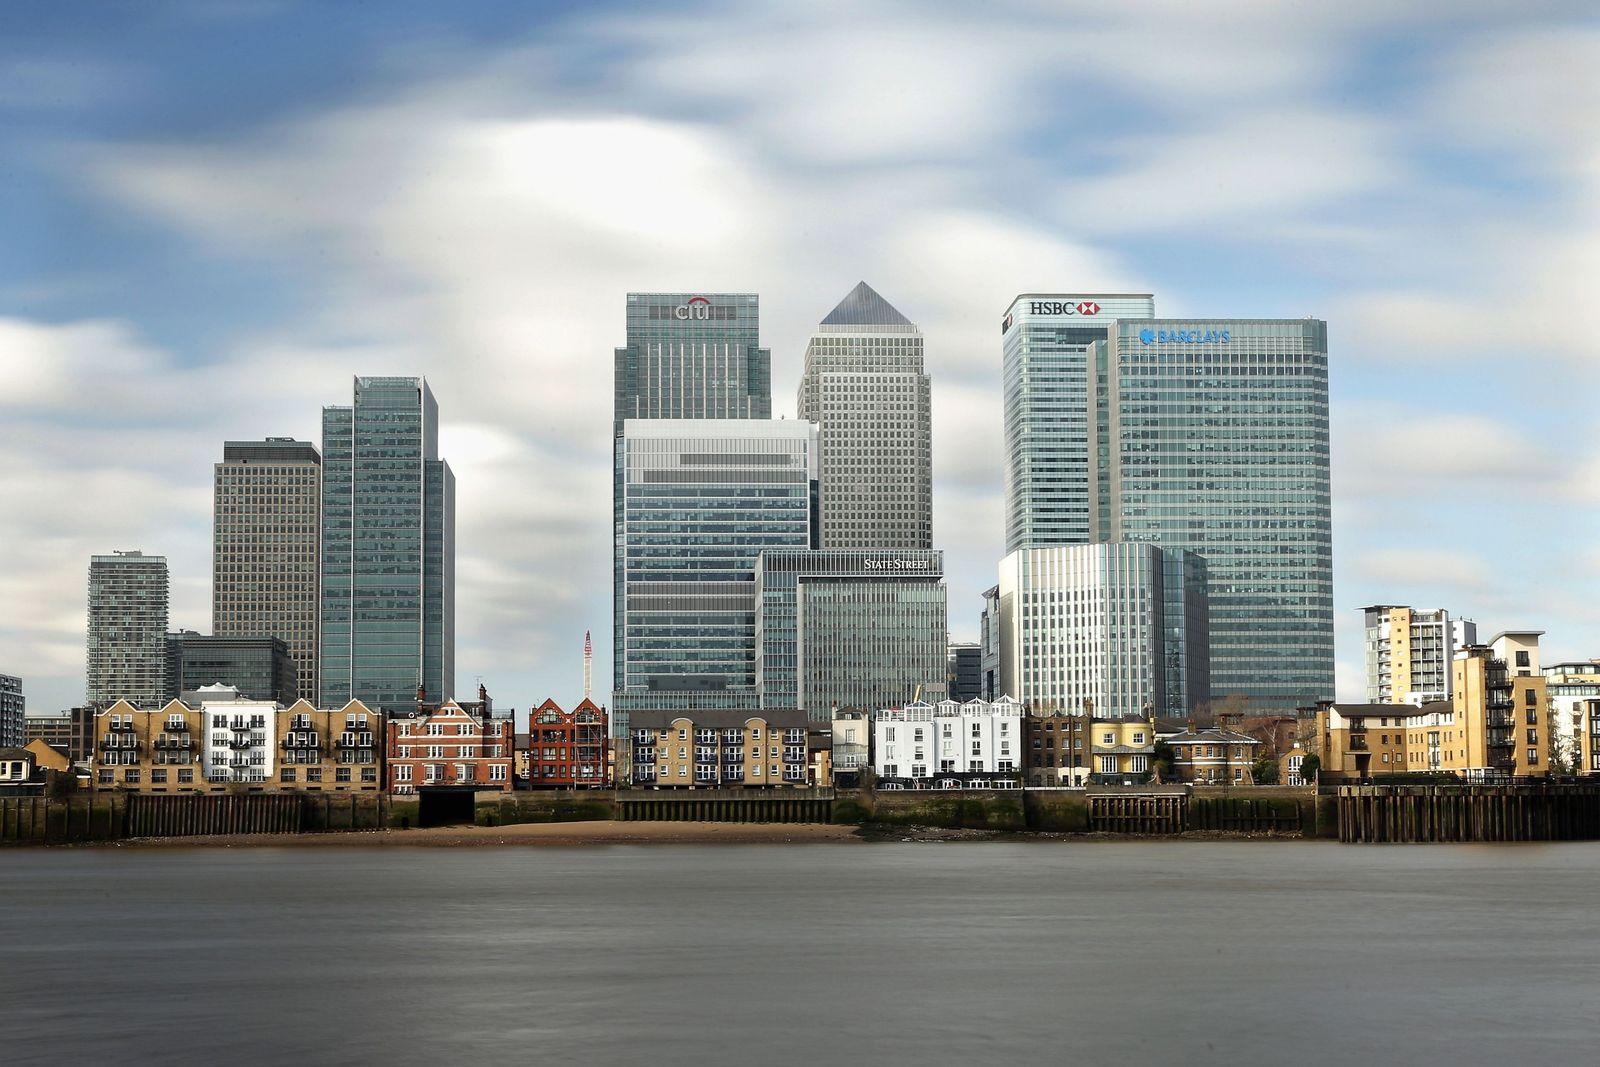 England / London / Banken-Viertel / Konjunktur / England / Brexit HSBC / Citi Group